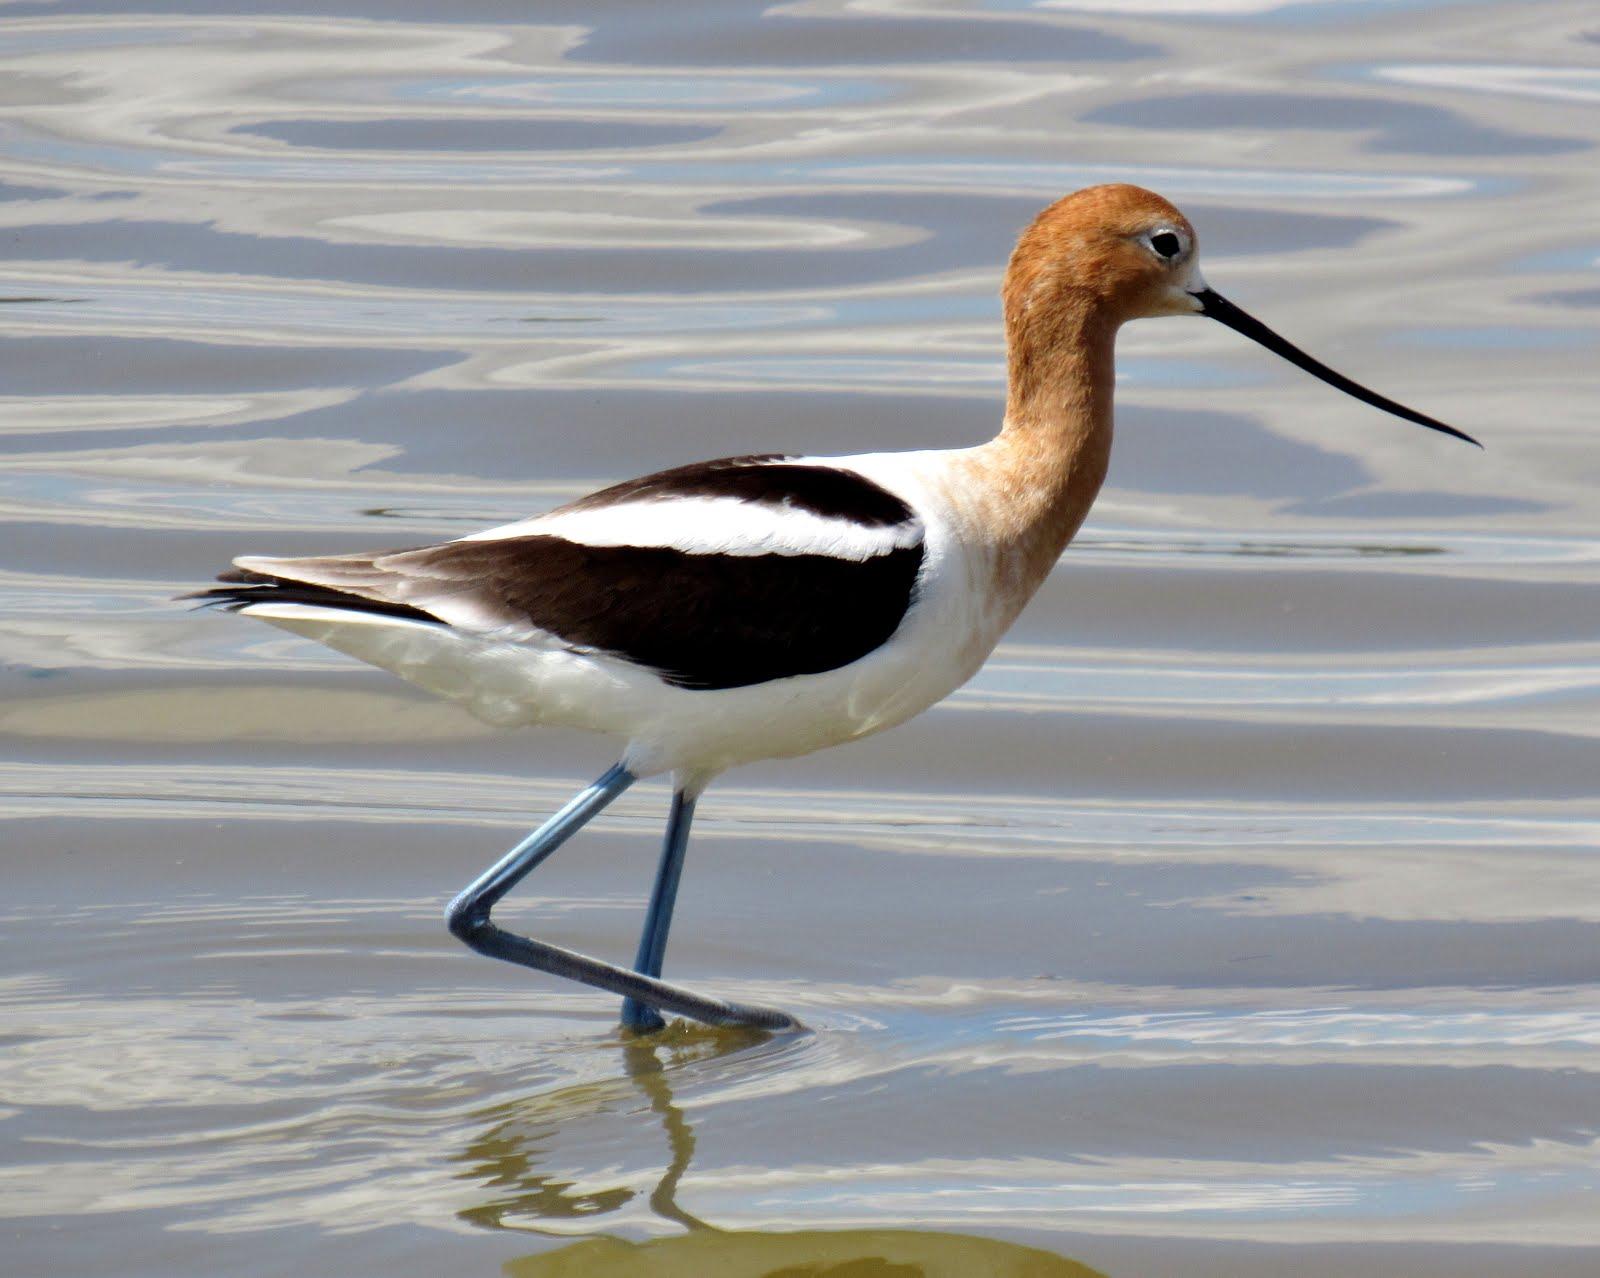 Wetland Wanderings: Exploring the Great Valley's Marshlands